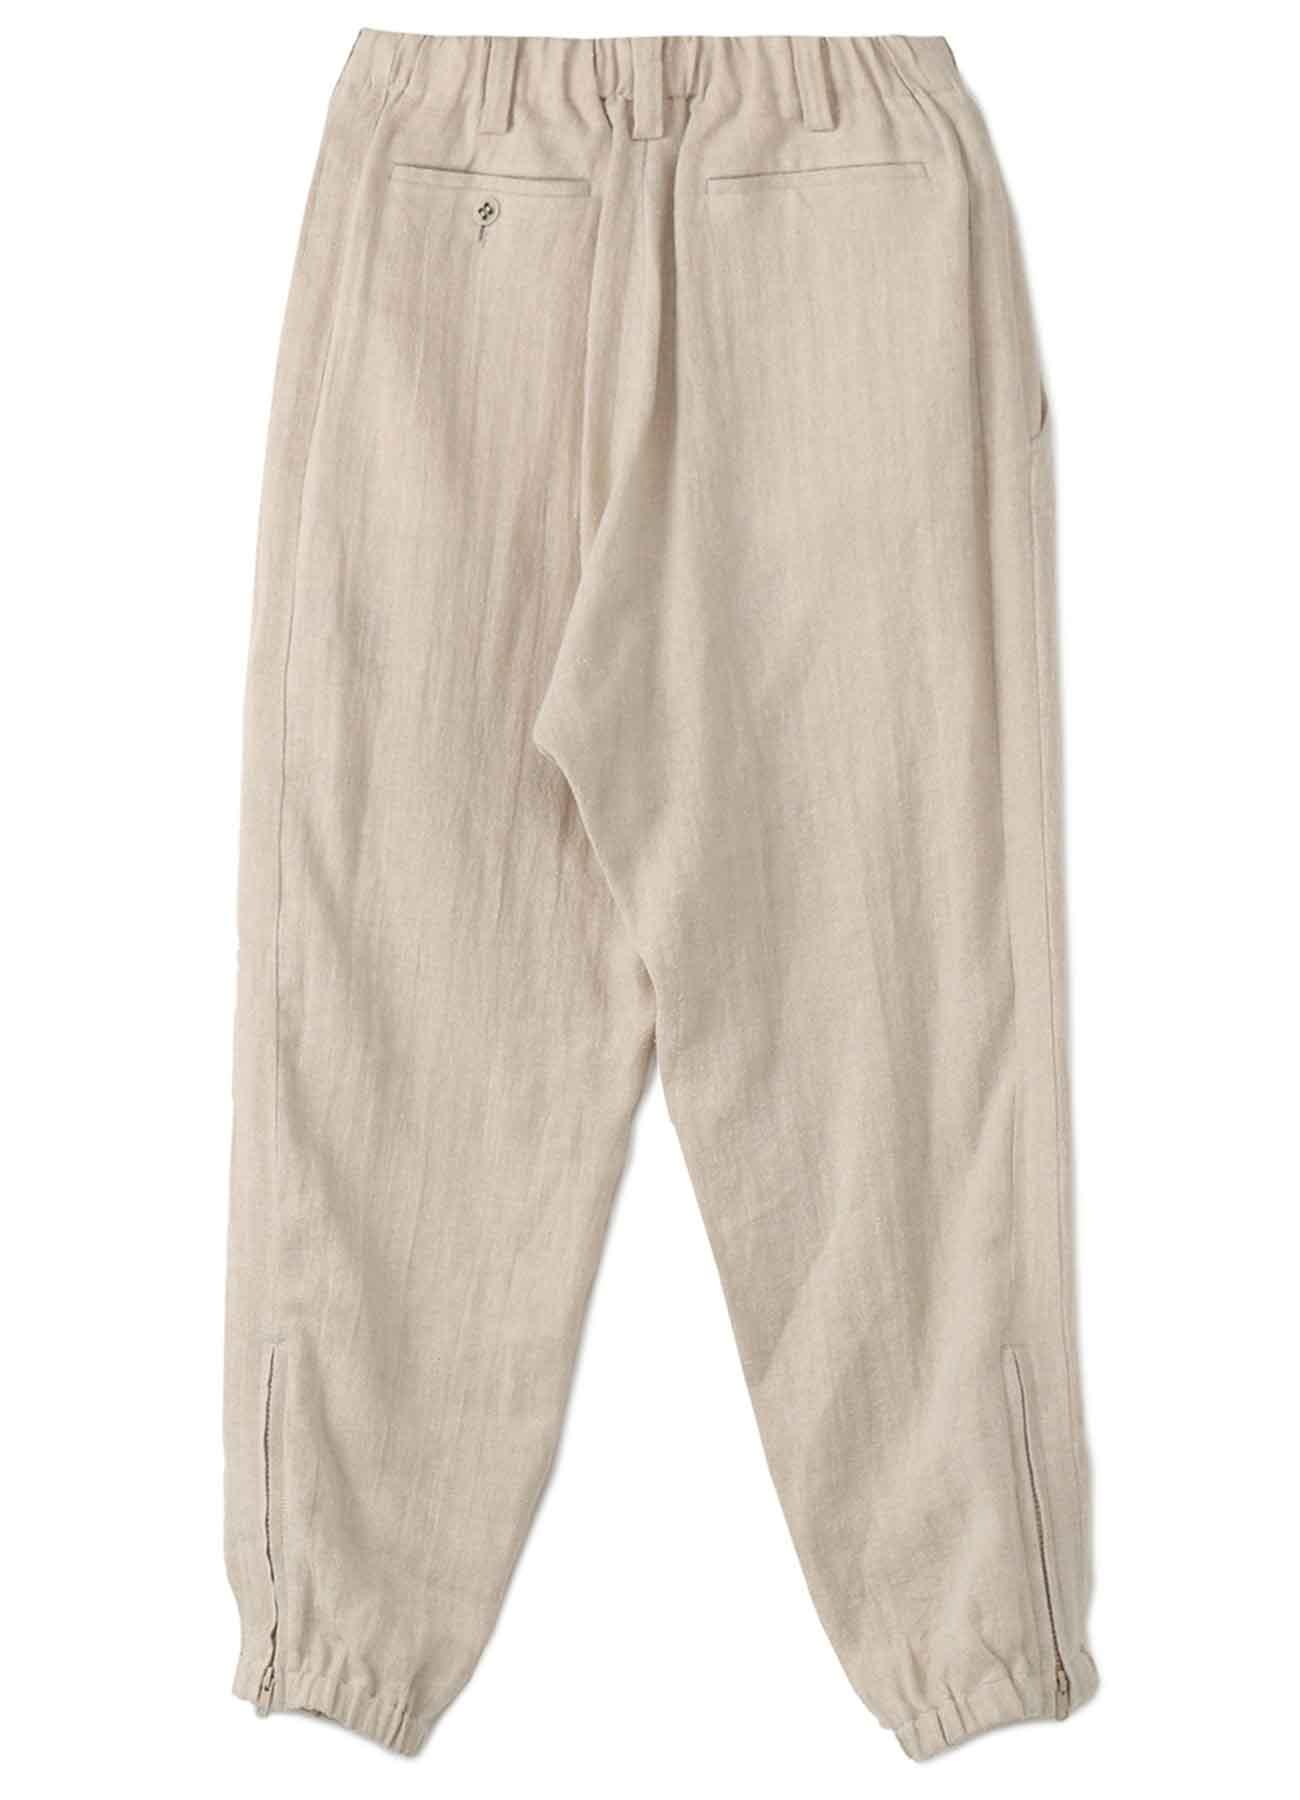 CLASSIC SILK NEP LINEN HERRINGBONE SIDE STRIPE PANTS